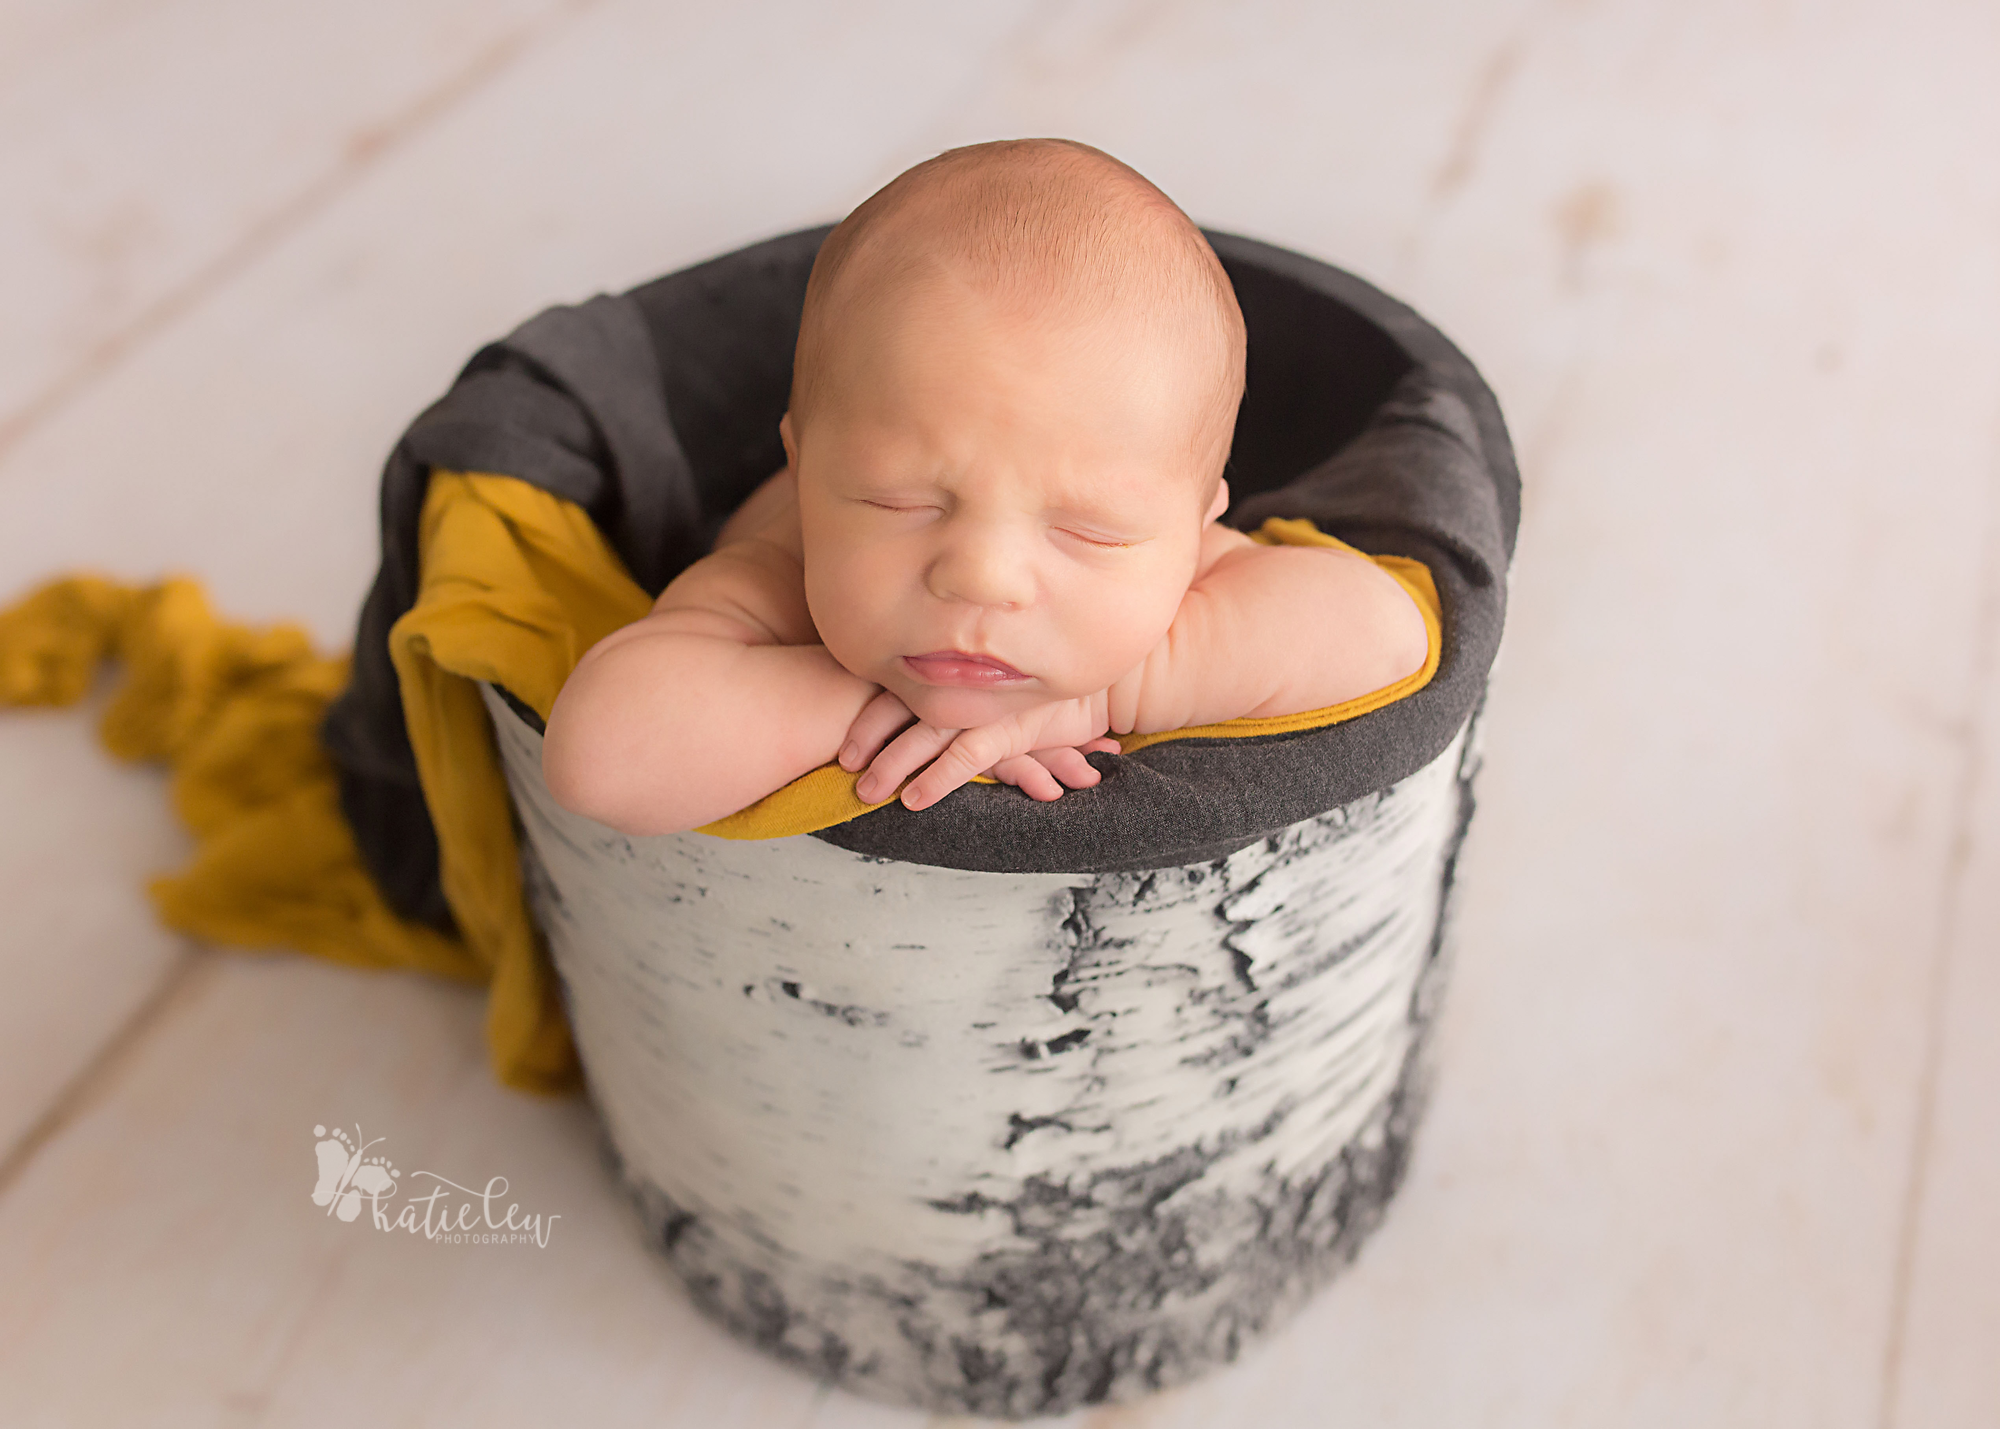 newborn baby boy in a birch tree planter